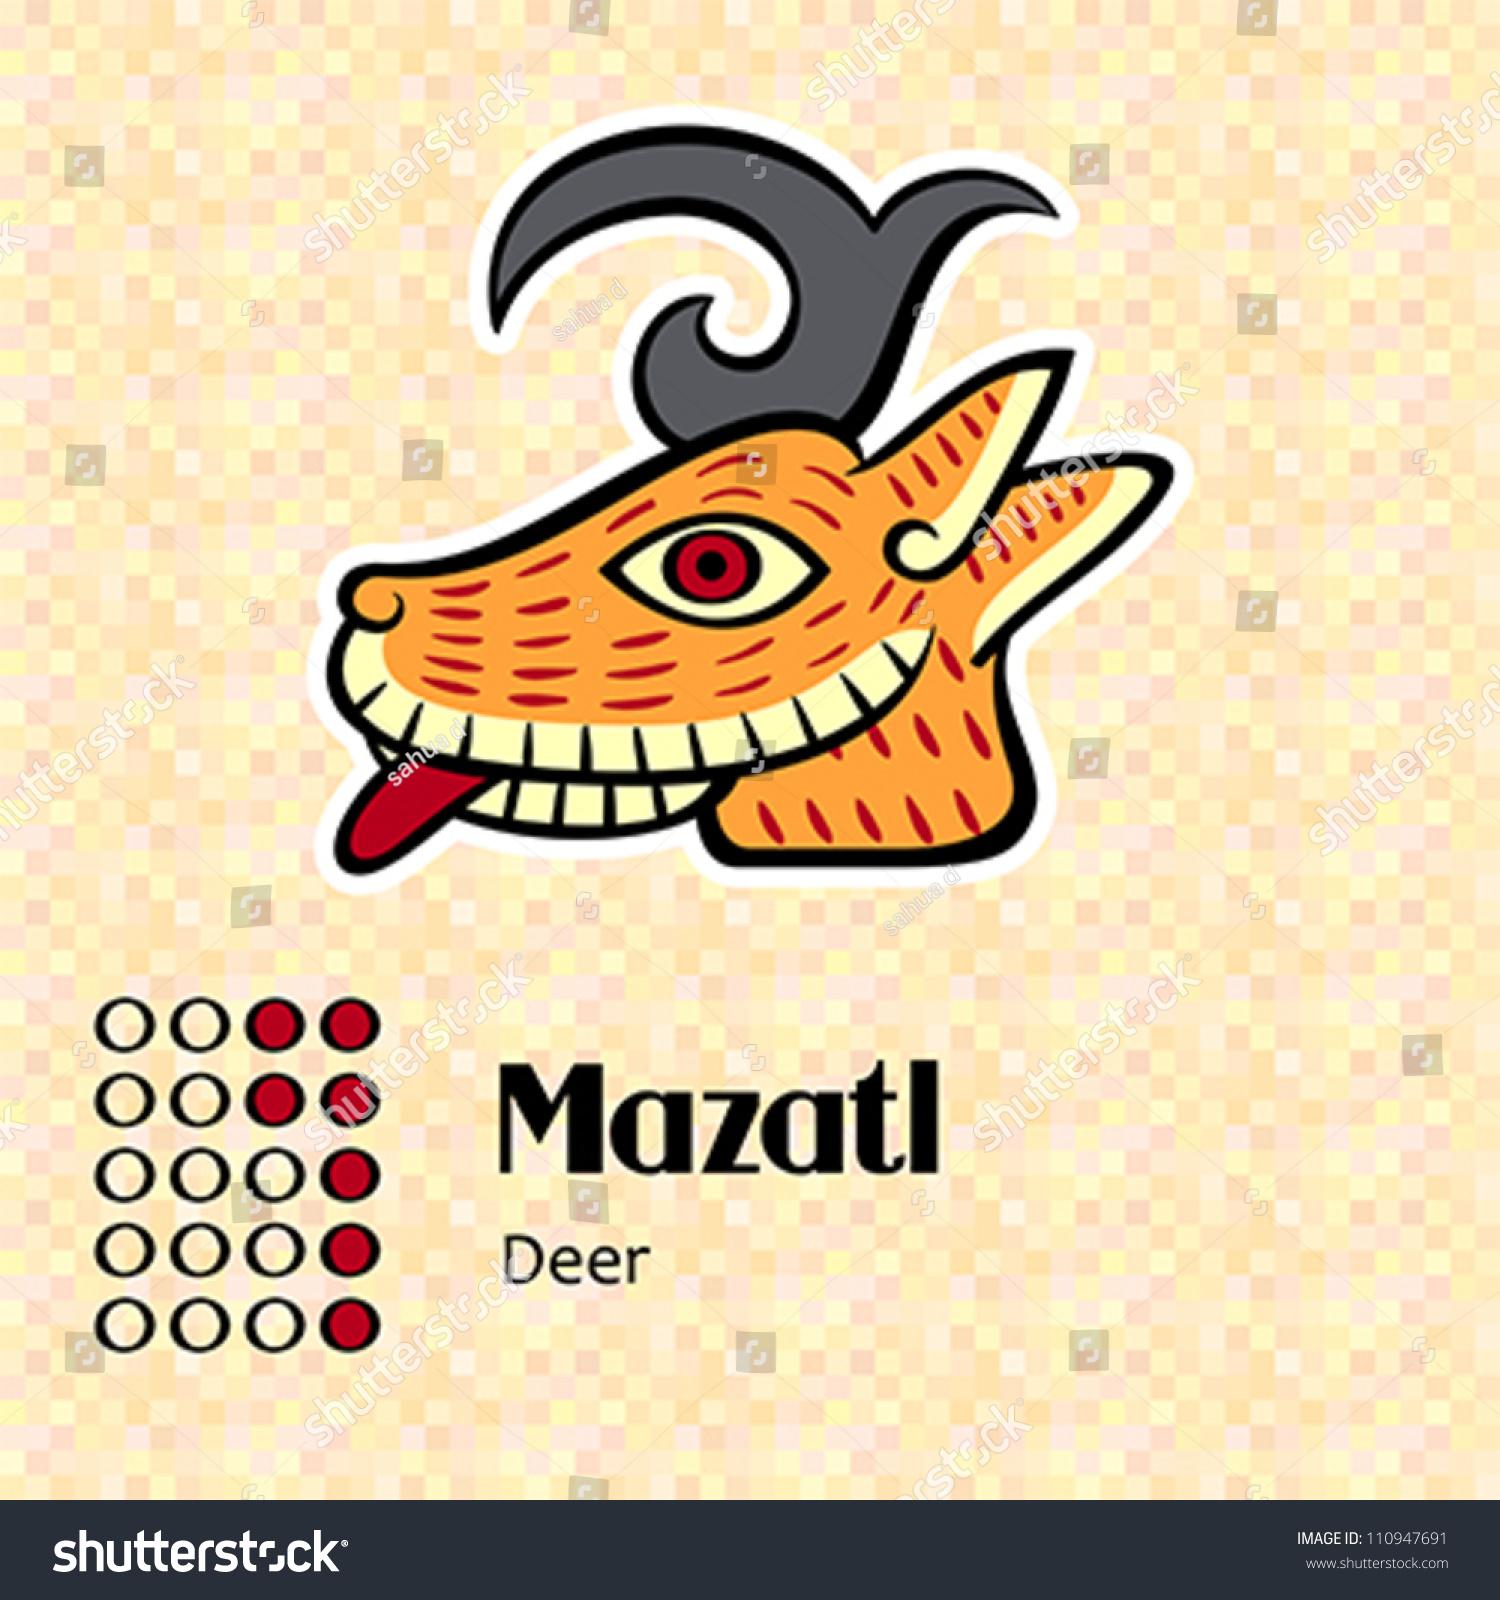 Aztec Calendar Symbols Mazatl Deer 7 Stock Vector Royalty Free